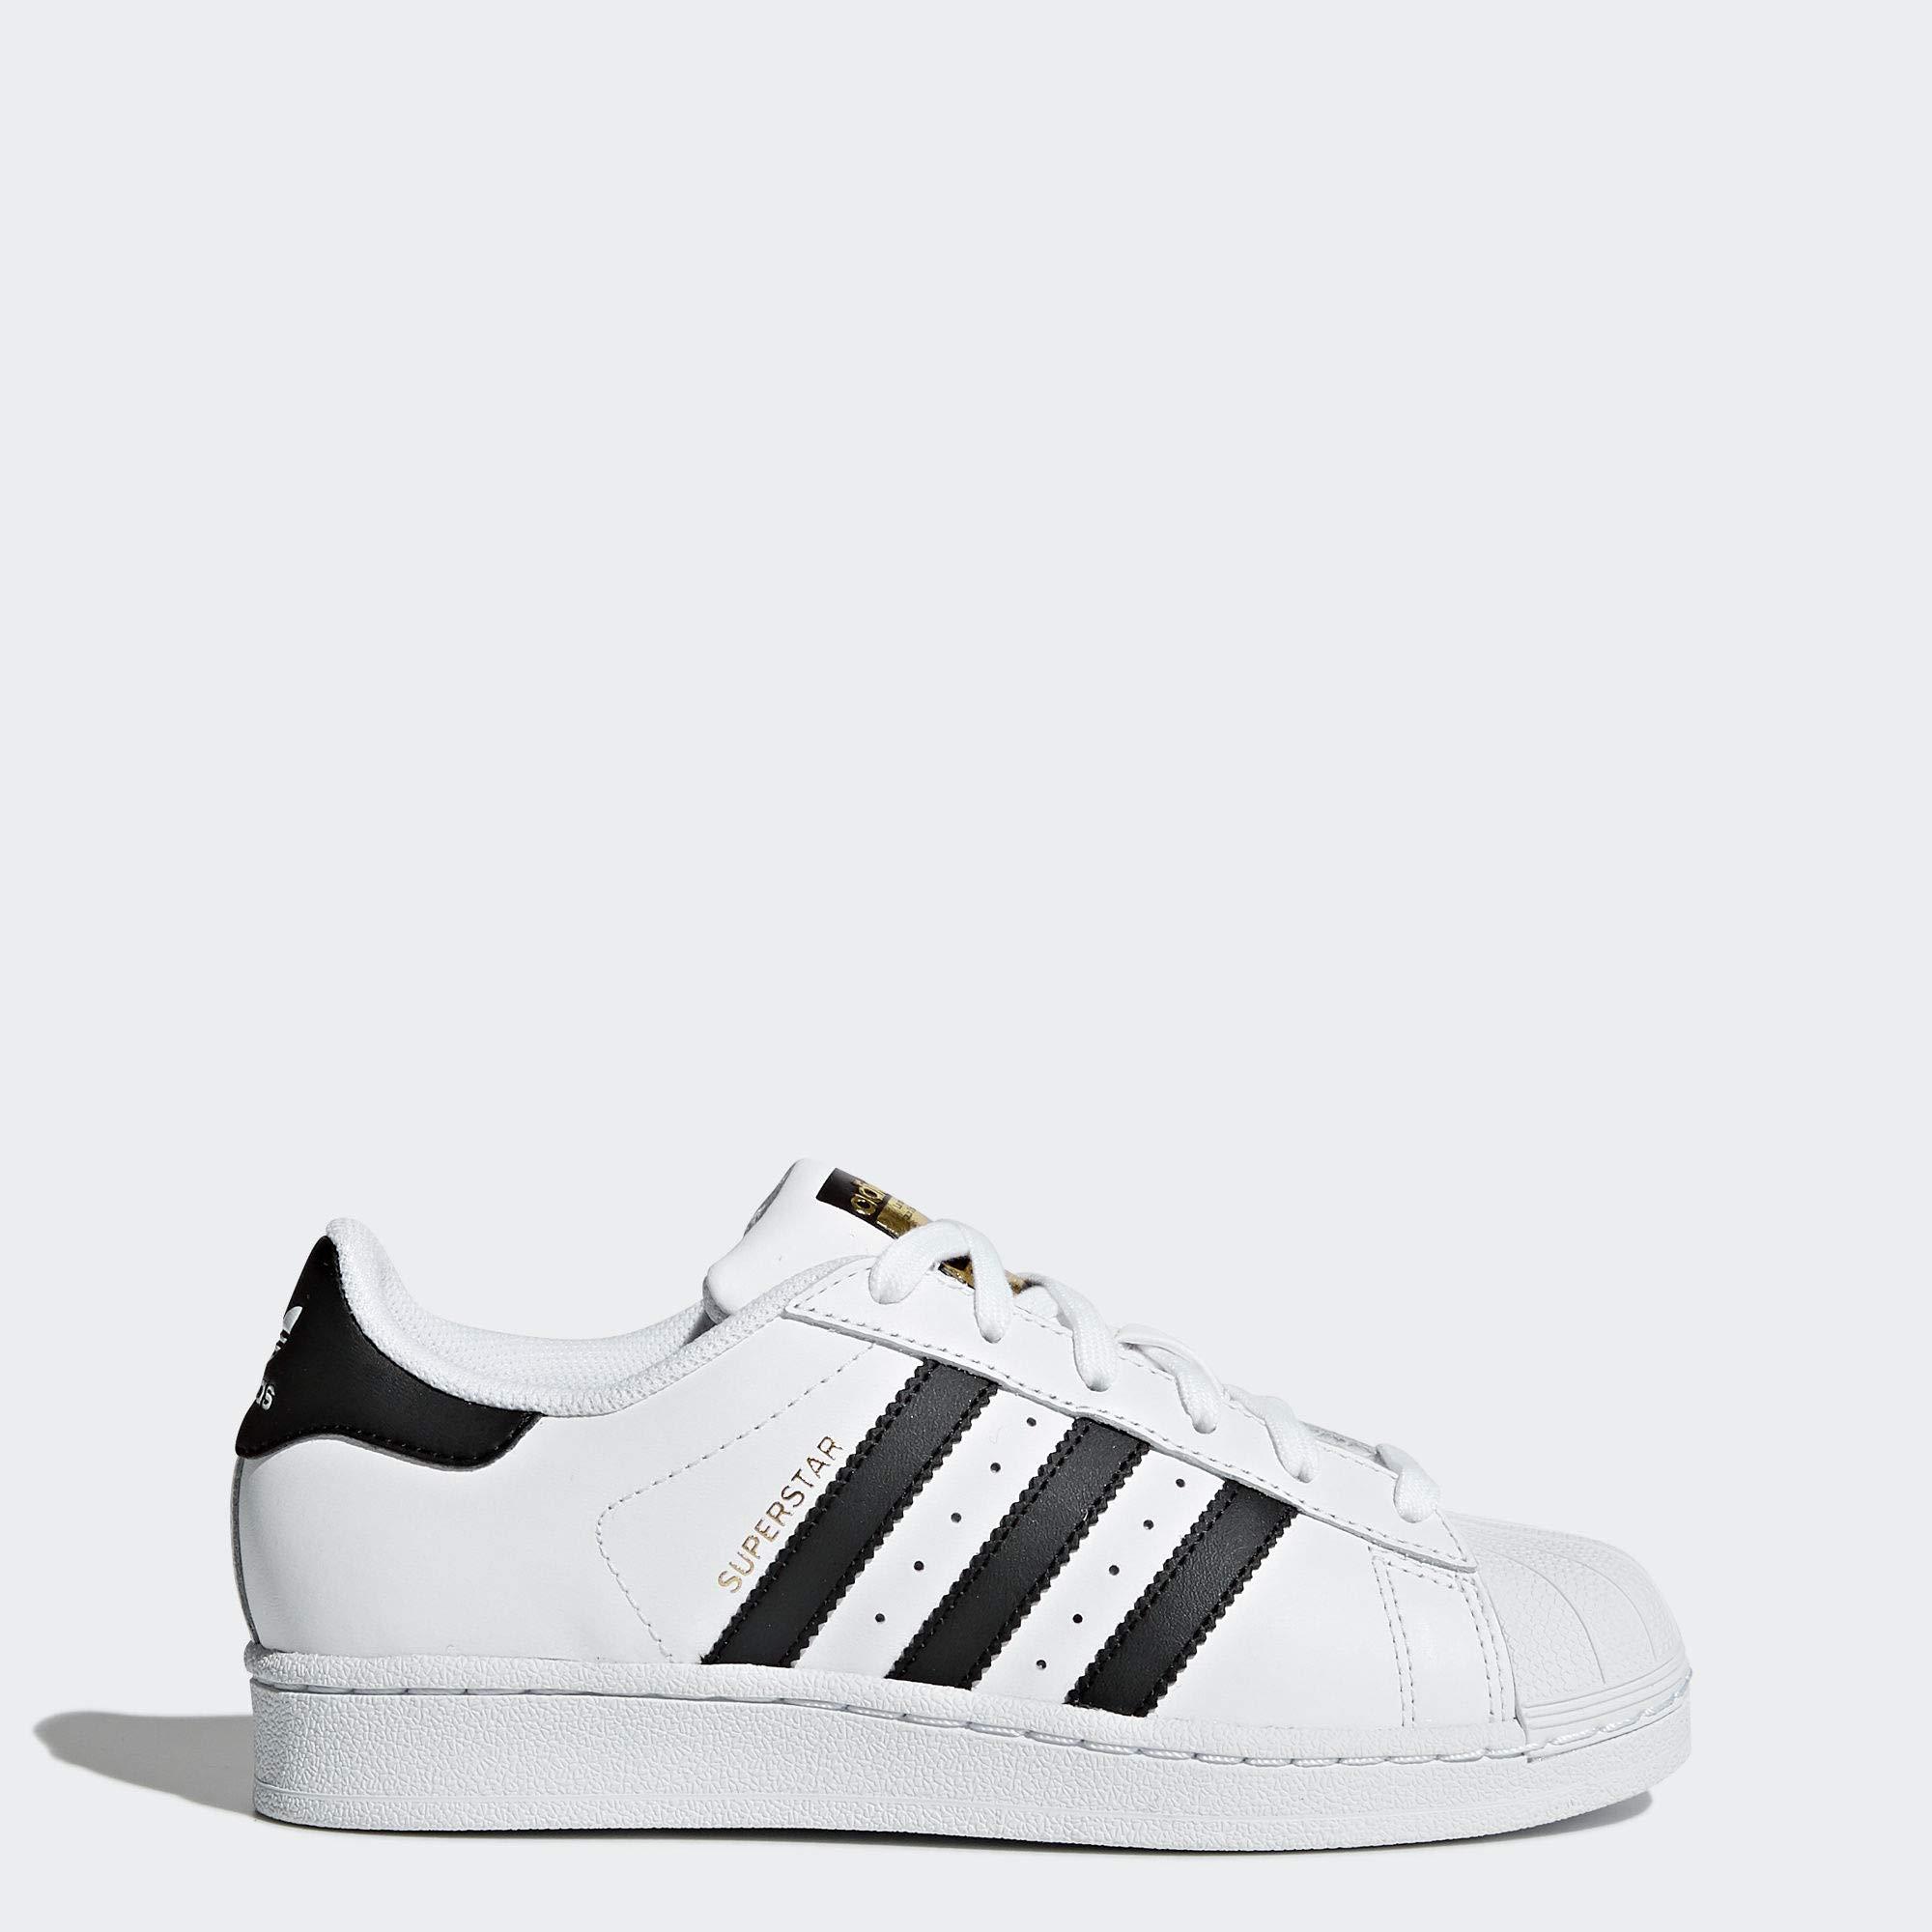 adidas Originals Junior's Superstar Sneaker, White/Core Black/Core White, 7 by adidas Originals